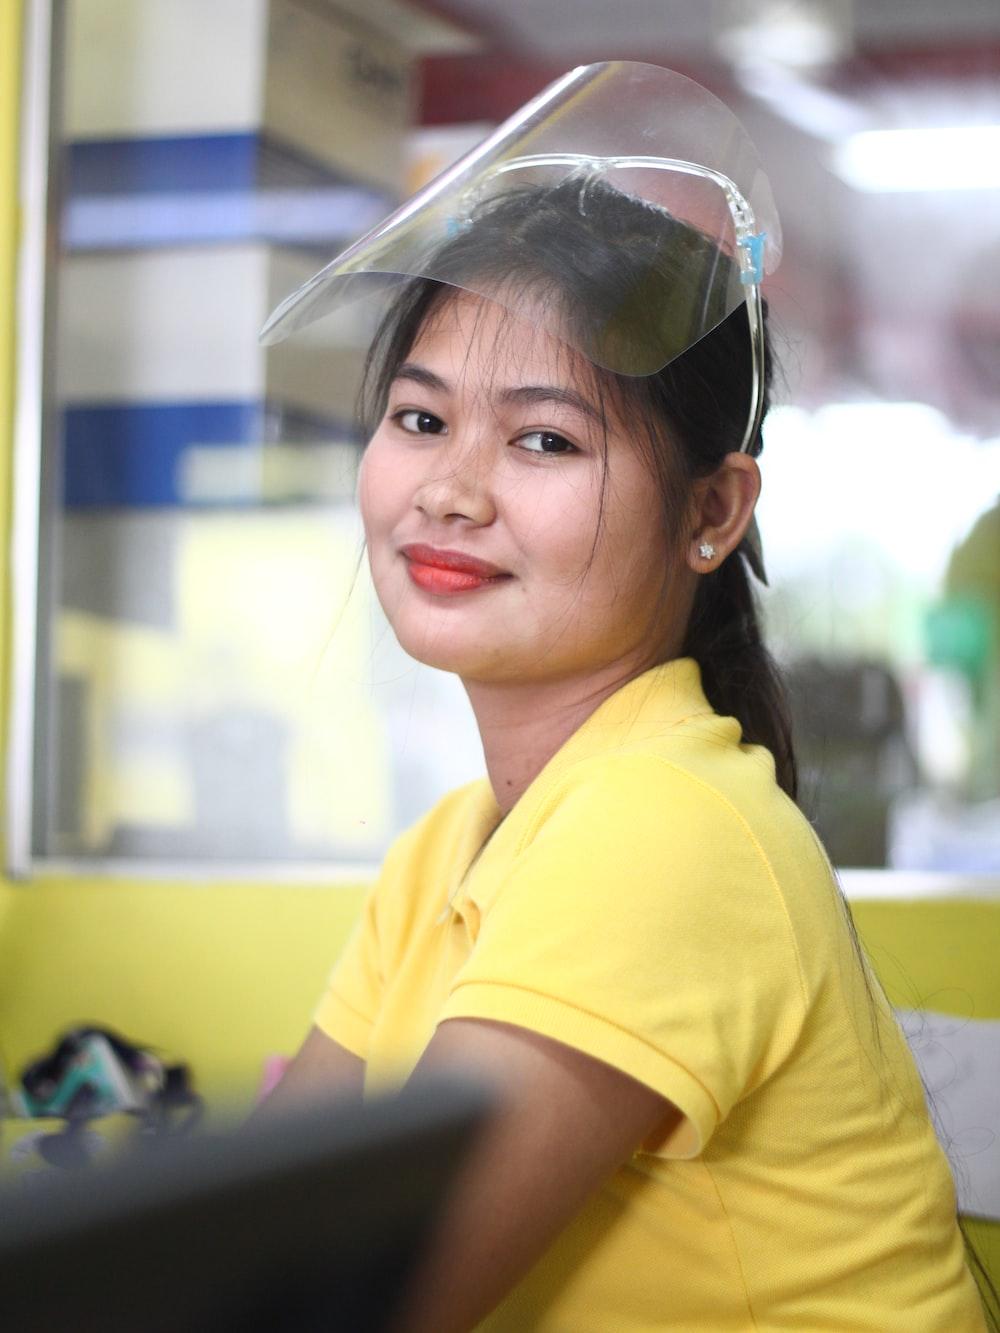 woman in yellow polo shirt wearing black sunglasses